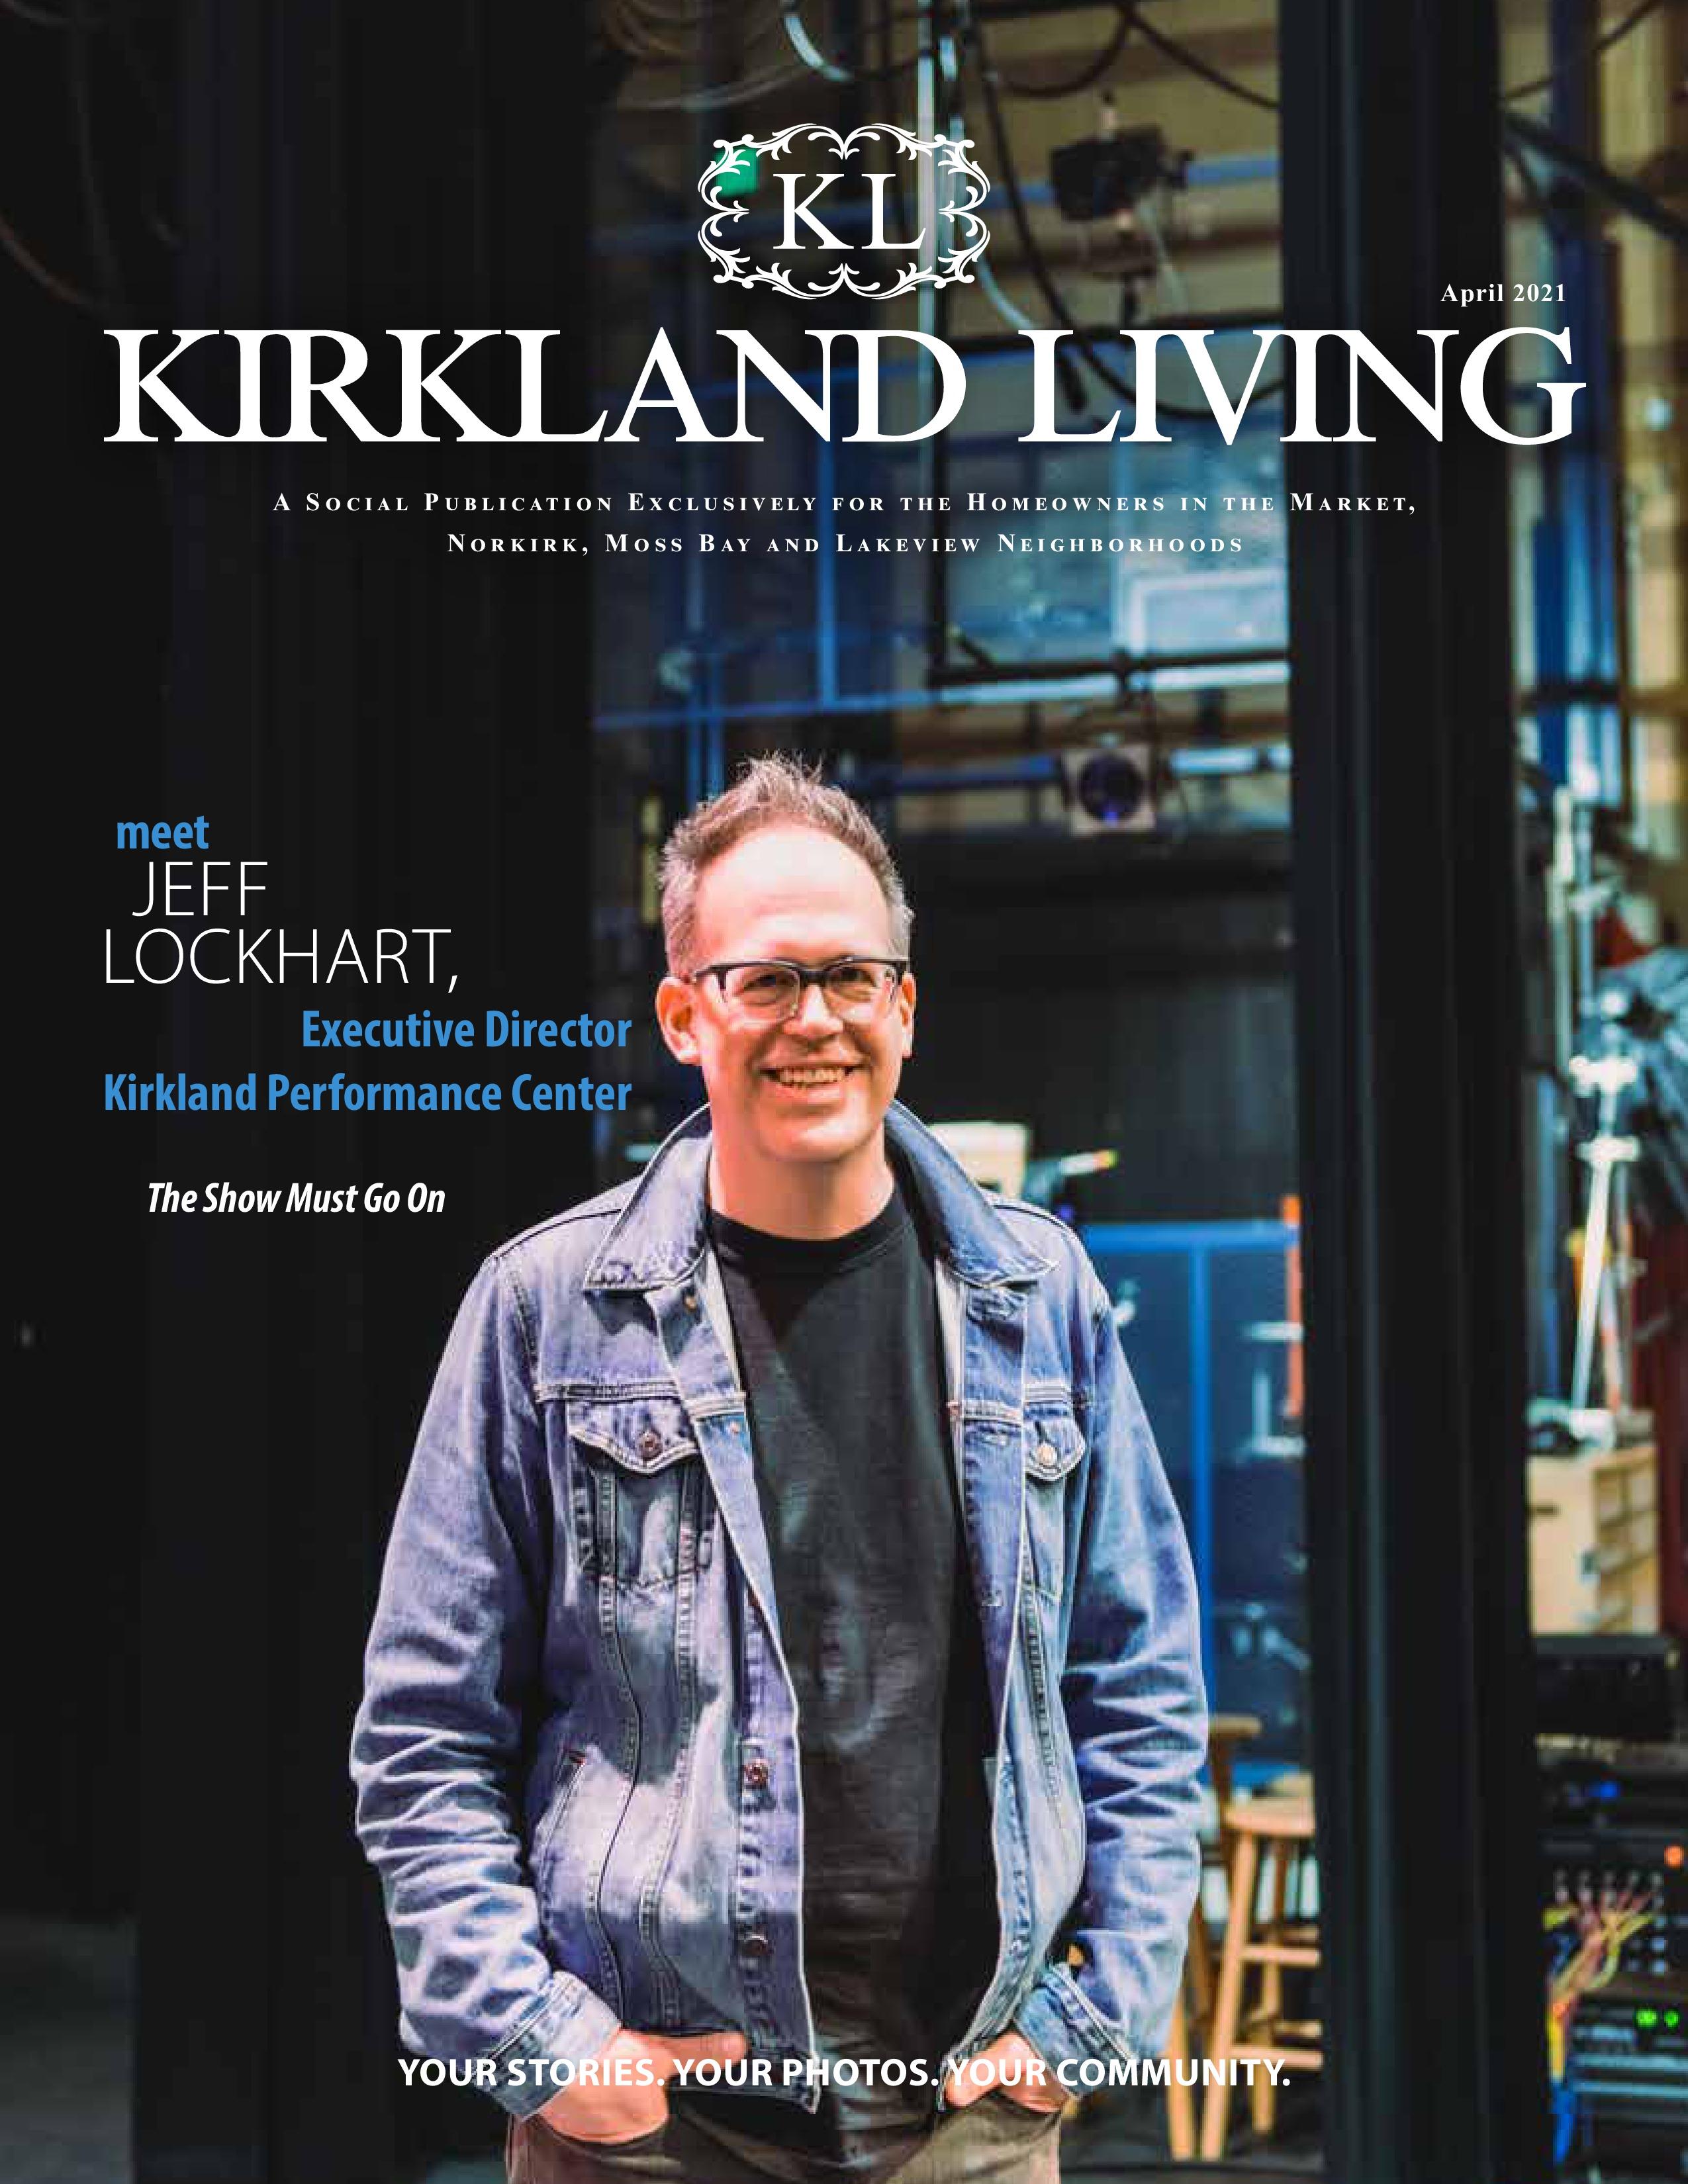 Kirkland Living 2021-04-01